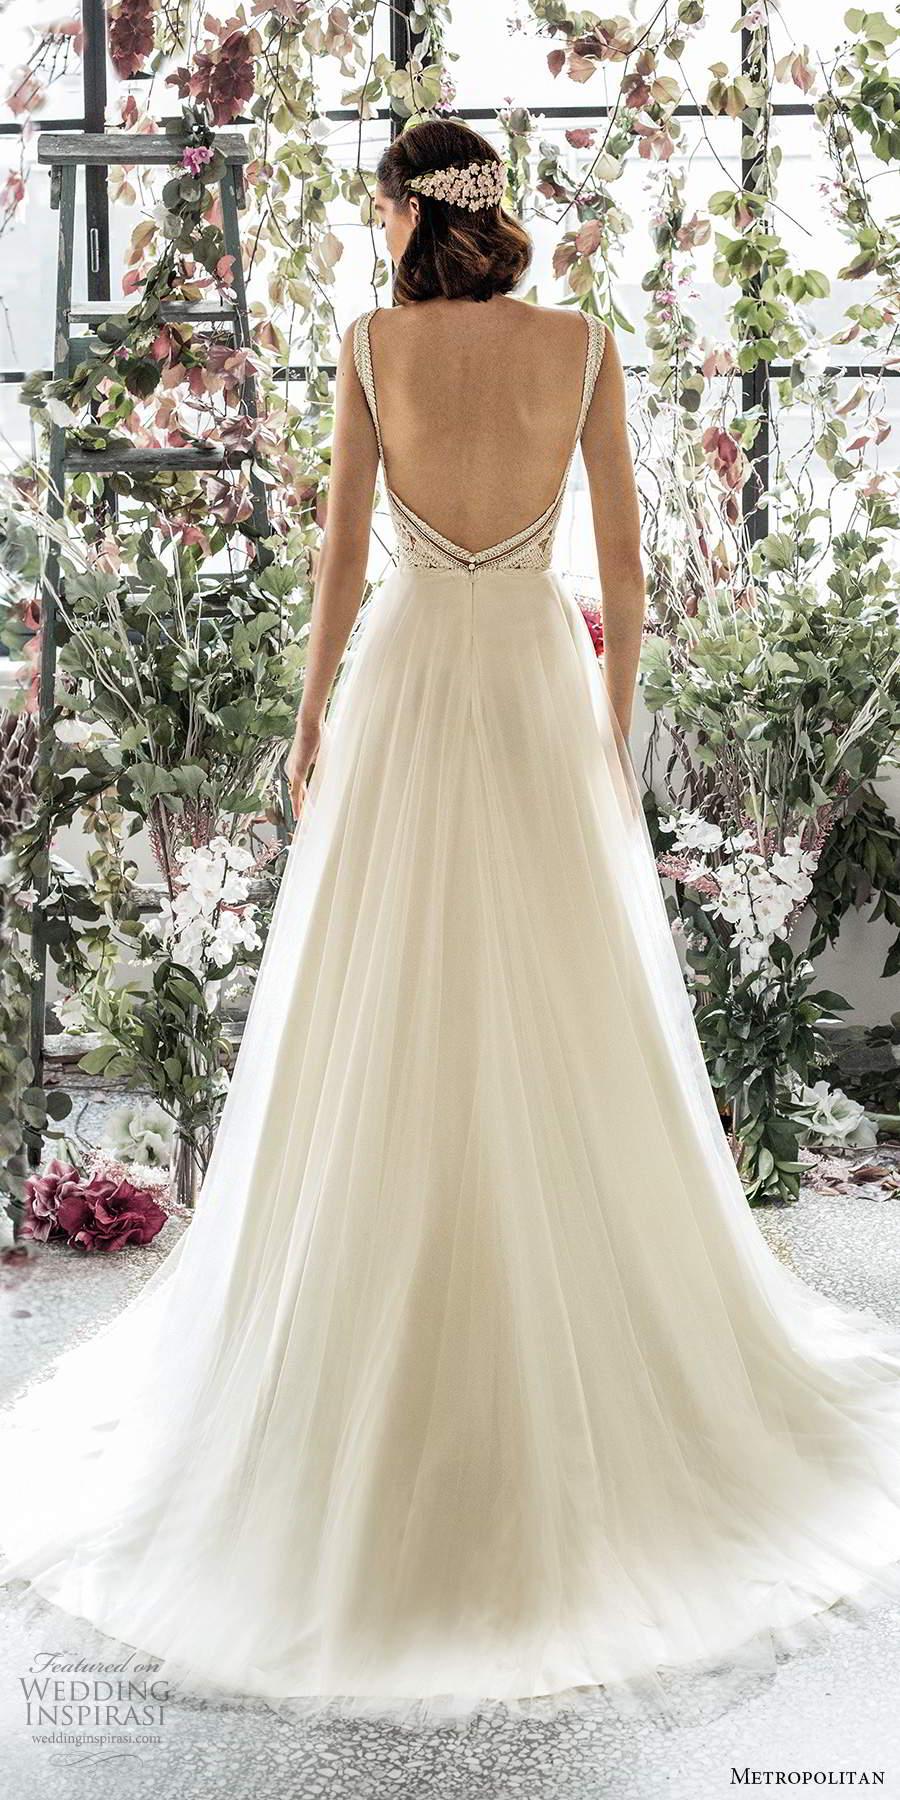 metropolitan spring 2020 bridal sleeveless thick straps plunging v neckline embellished lace bodice soft a line wedding dress low back chapel train (12) bv